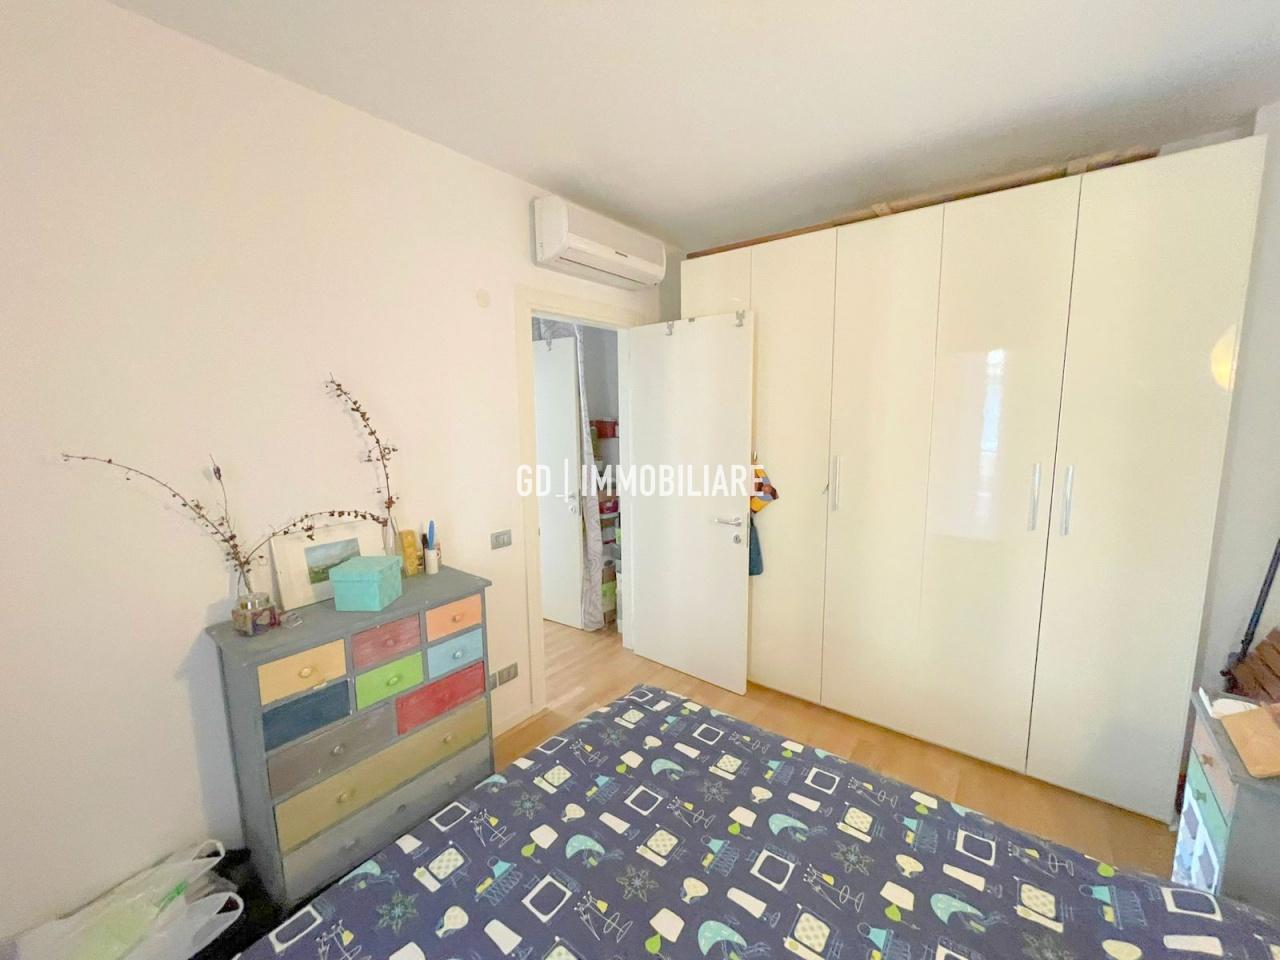 Appartamento MONTEBELLUNA GM1_1